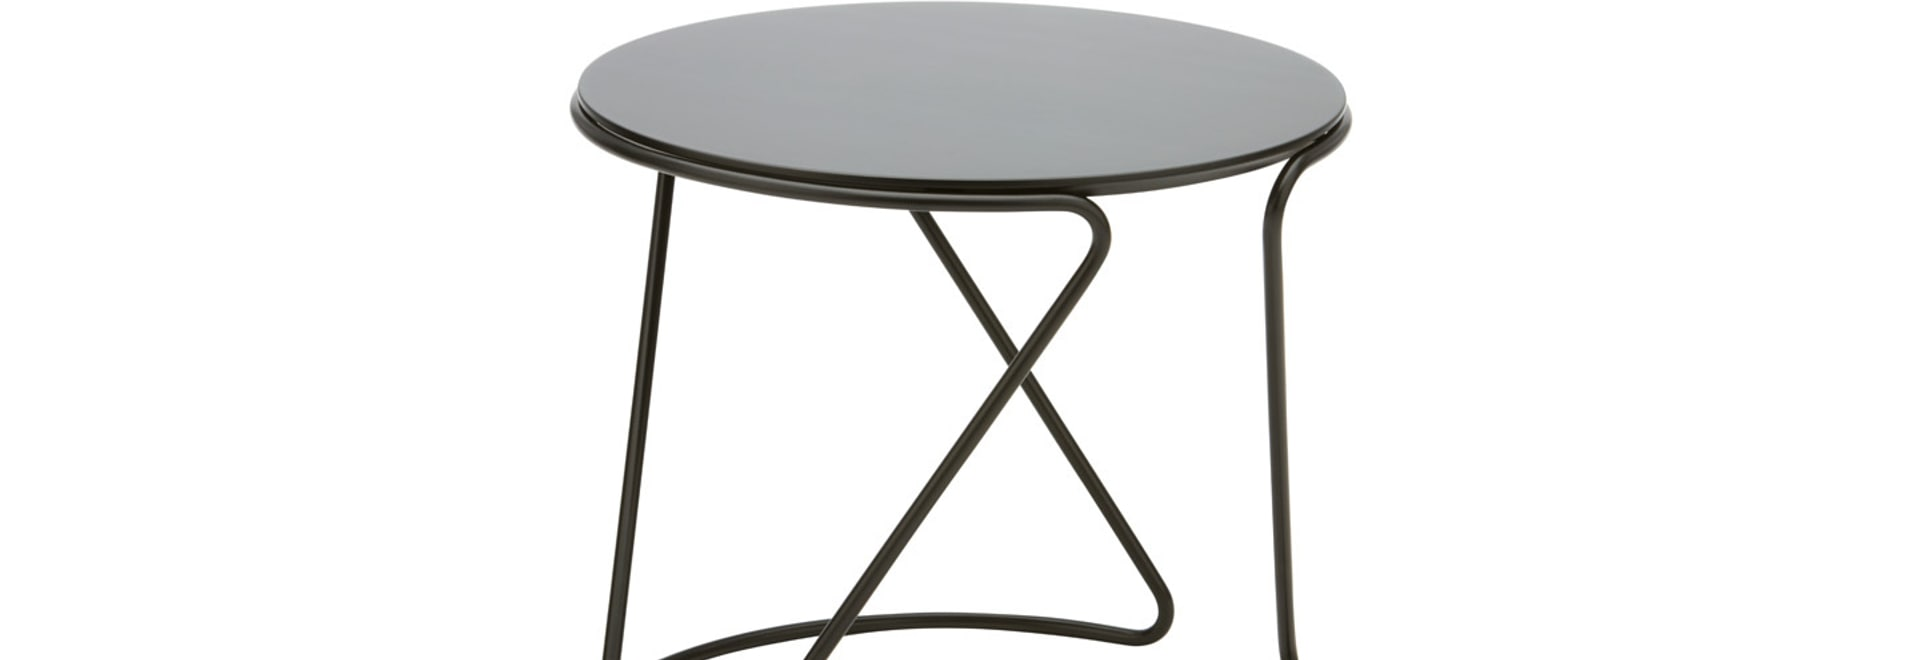 THONET TABLE S 18